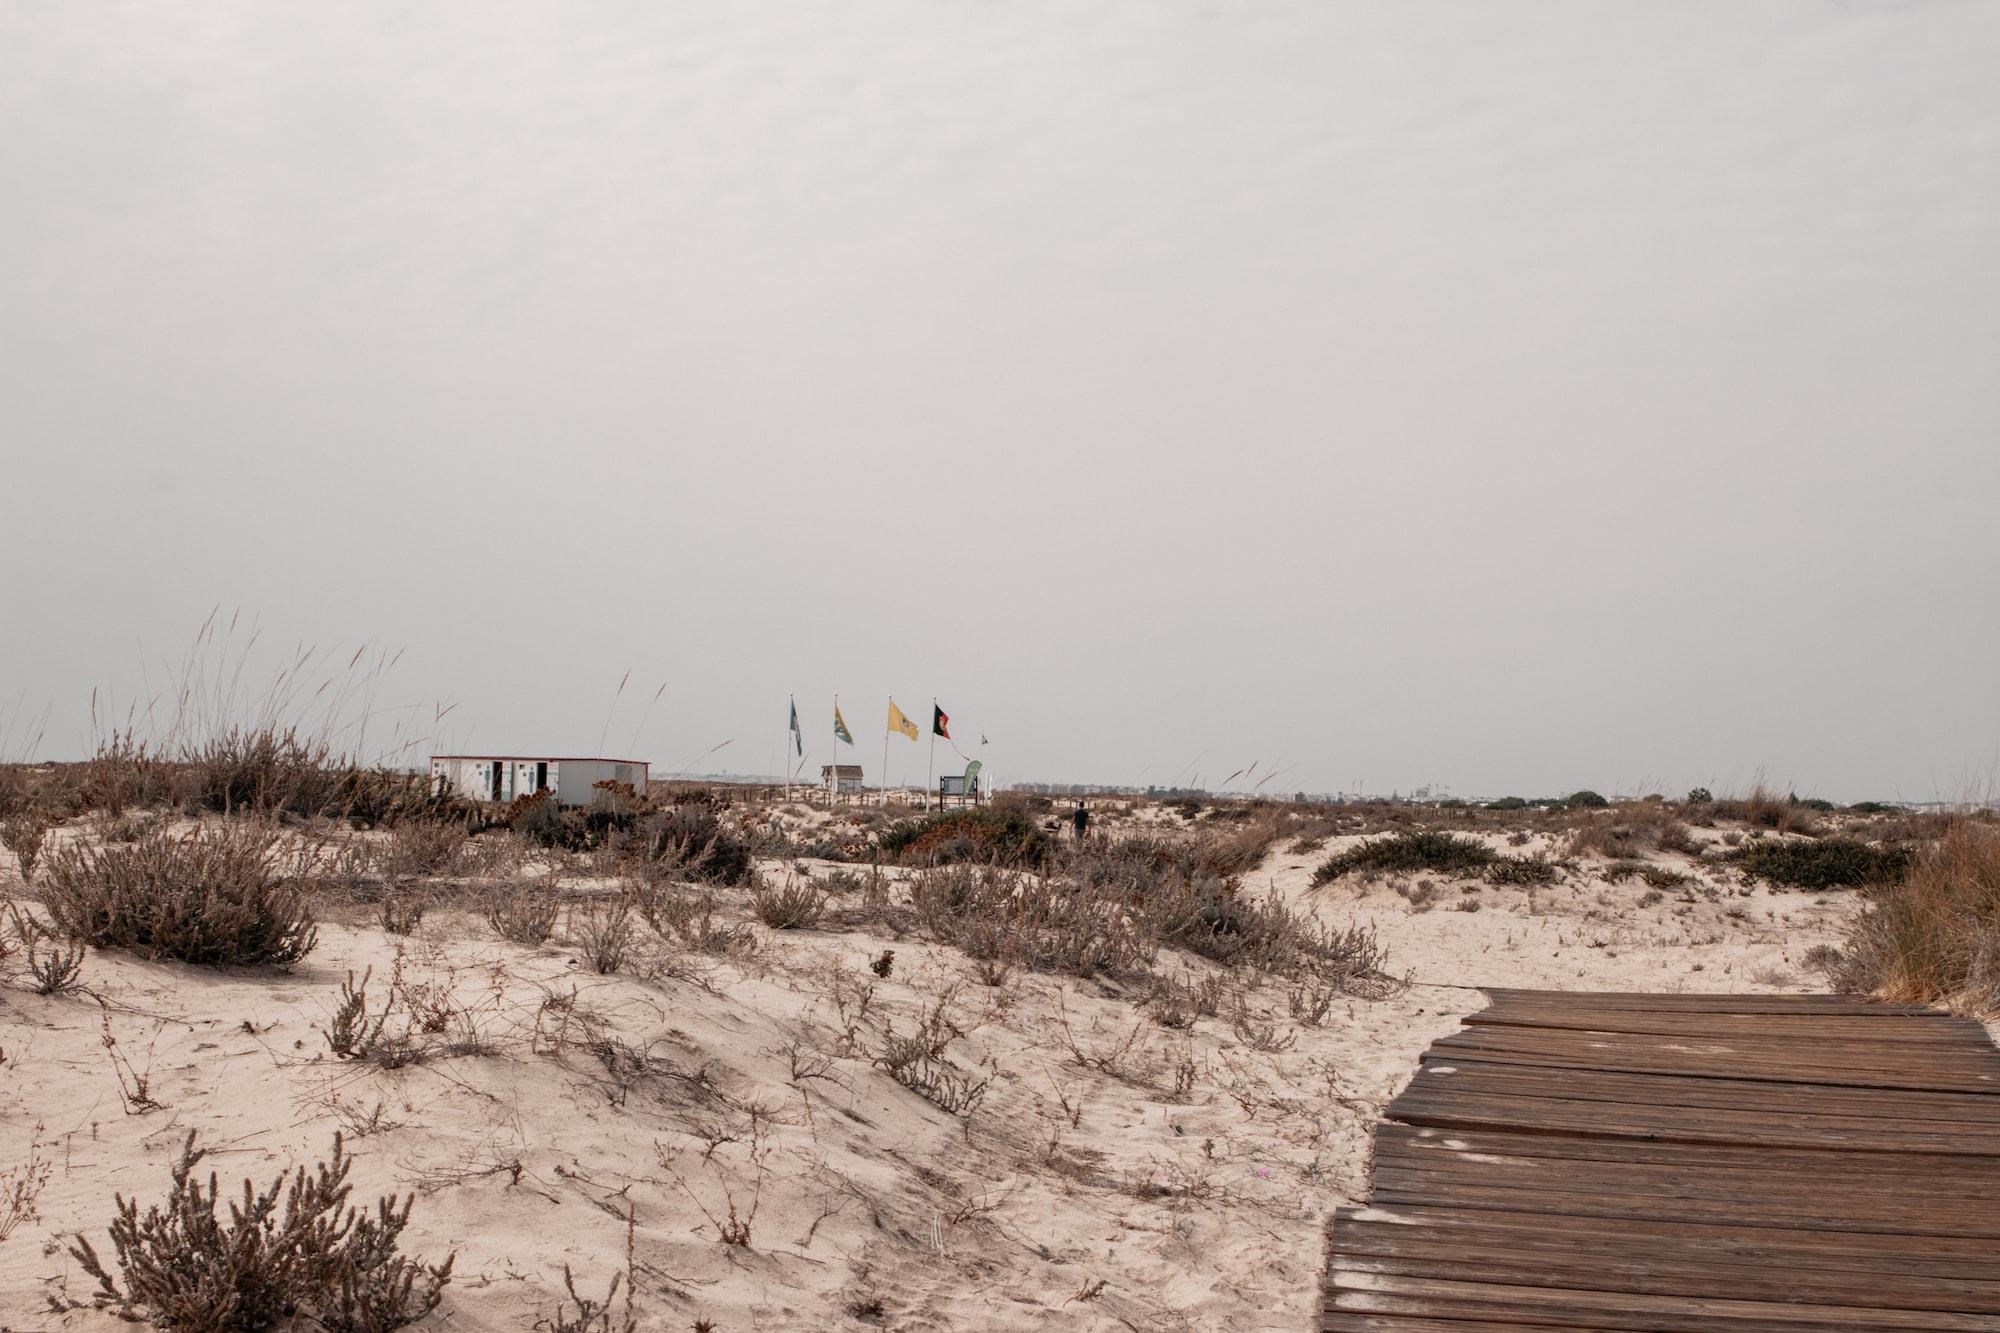 ilha da armona strand